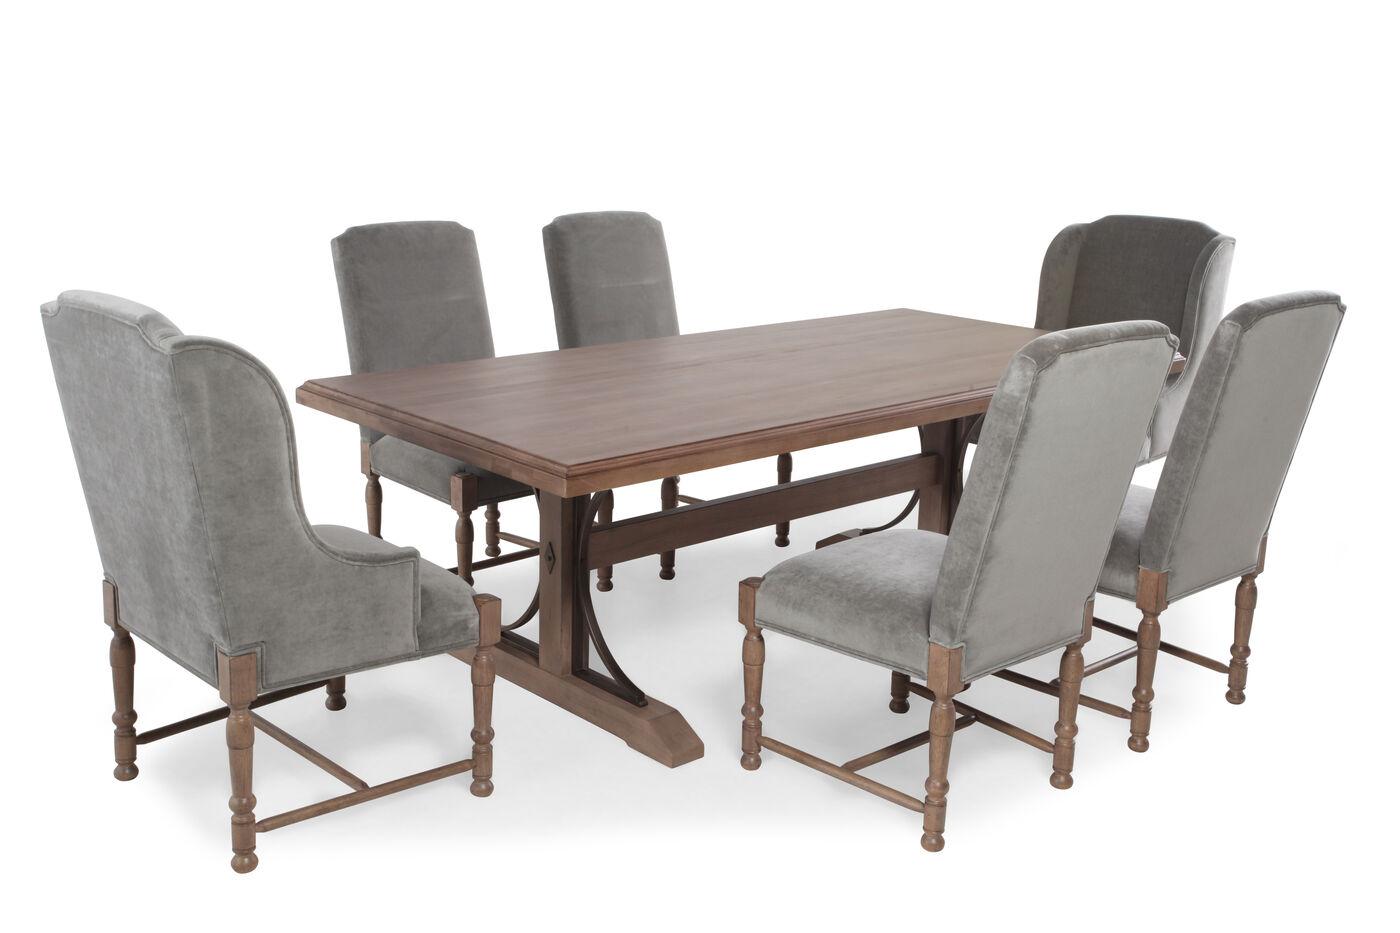 universal authenticity oxford seven piece dining set : seven piece dining set